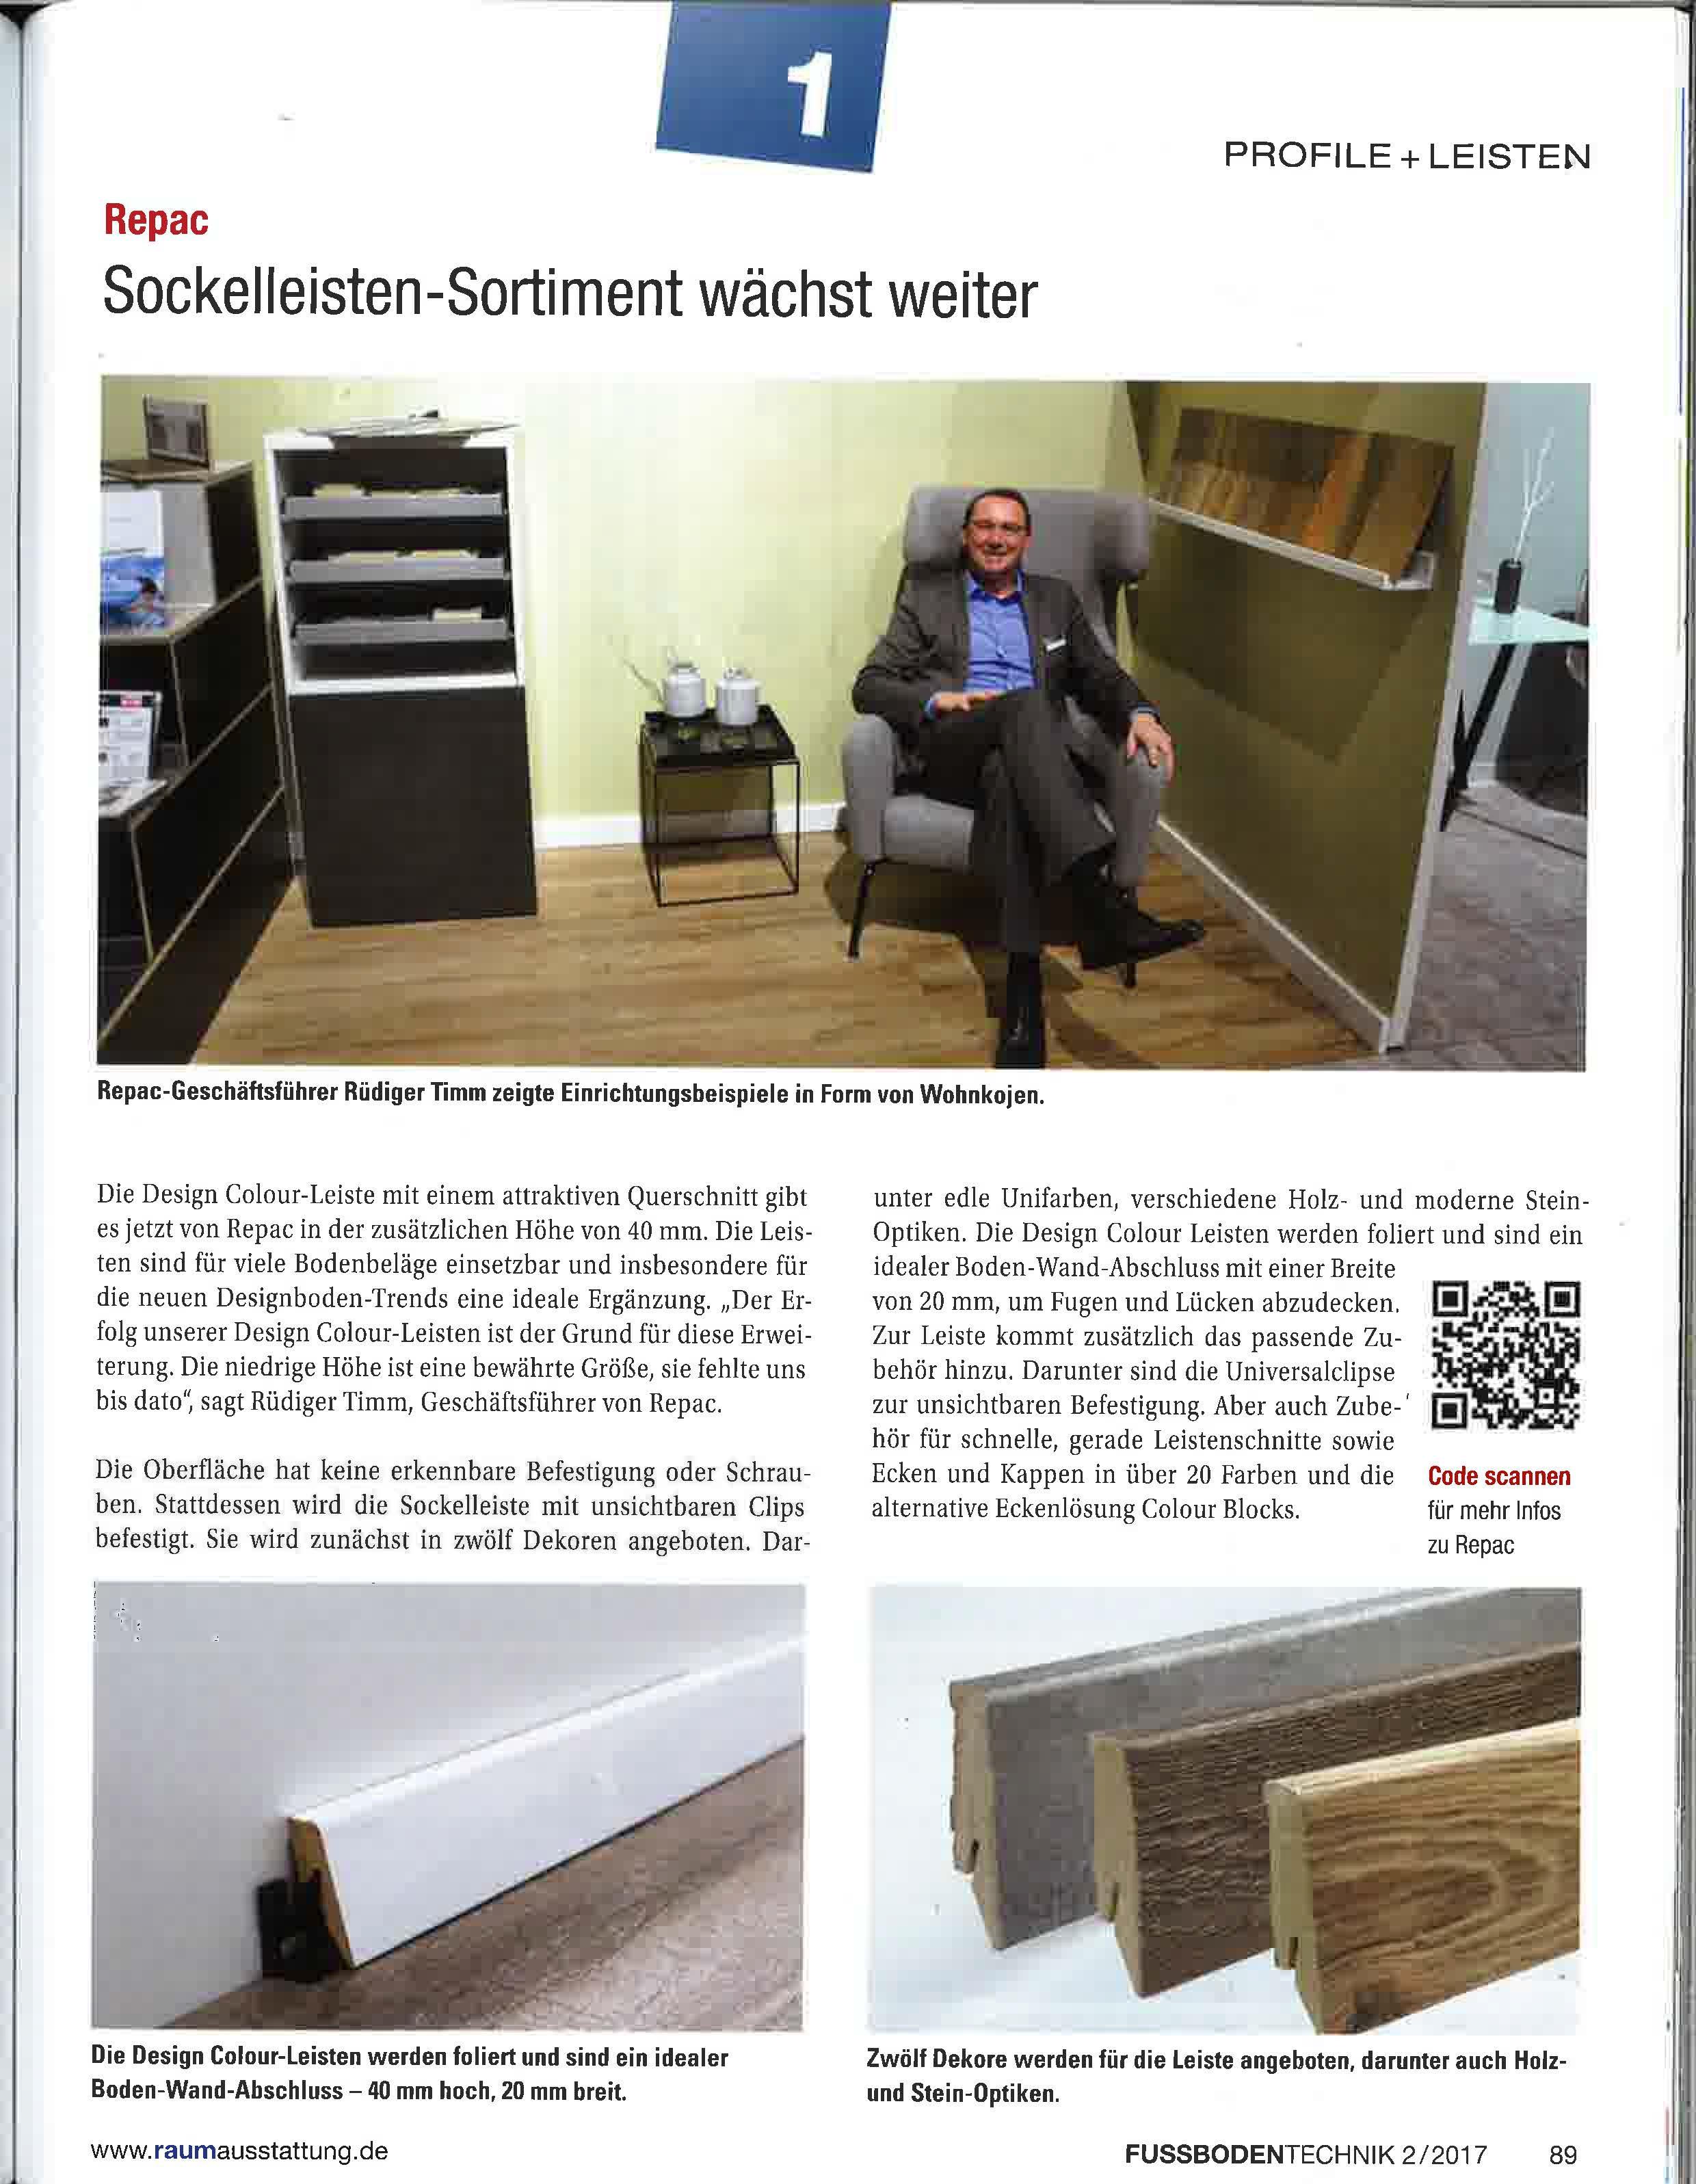 fussboden technik repac montagetechnik gmbh co kg. Black Bedroom Furniture Sets. Home Design Ideas